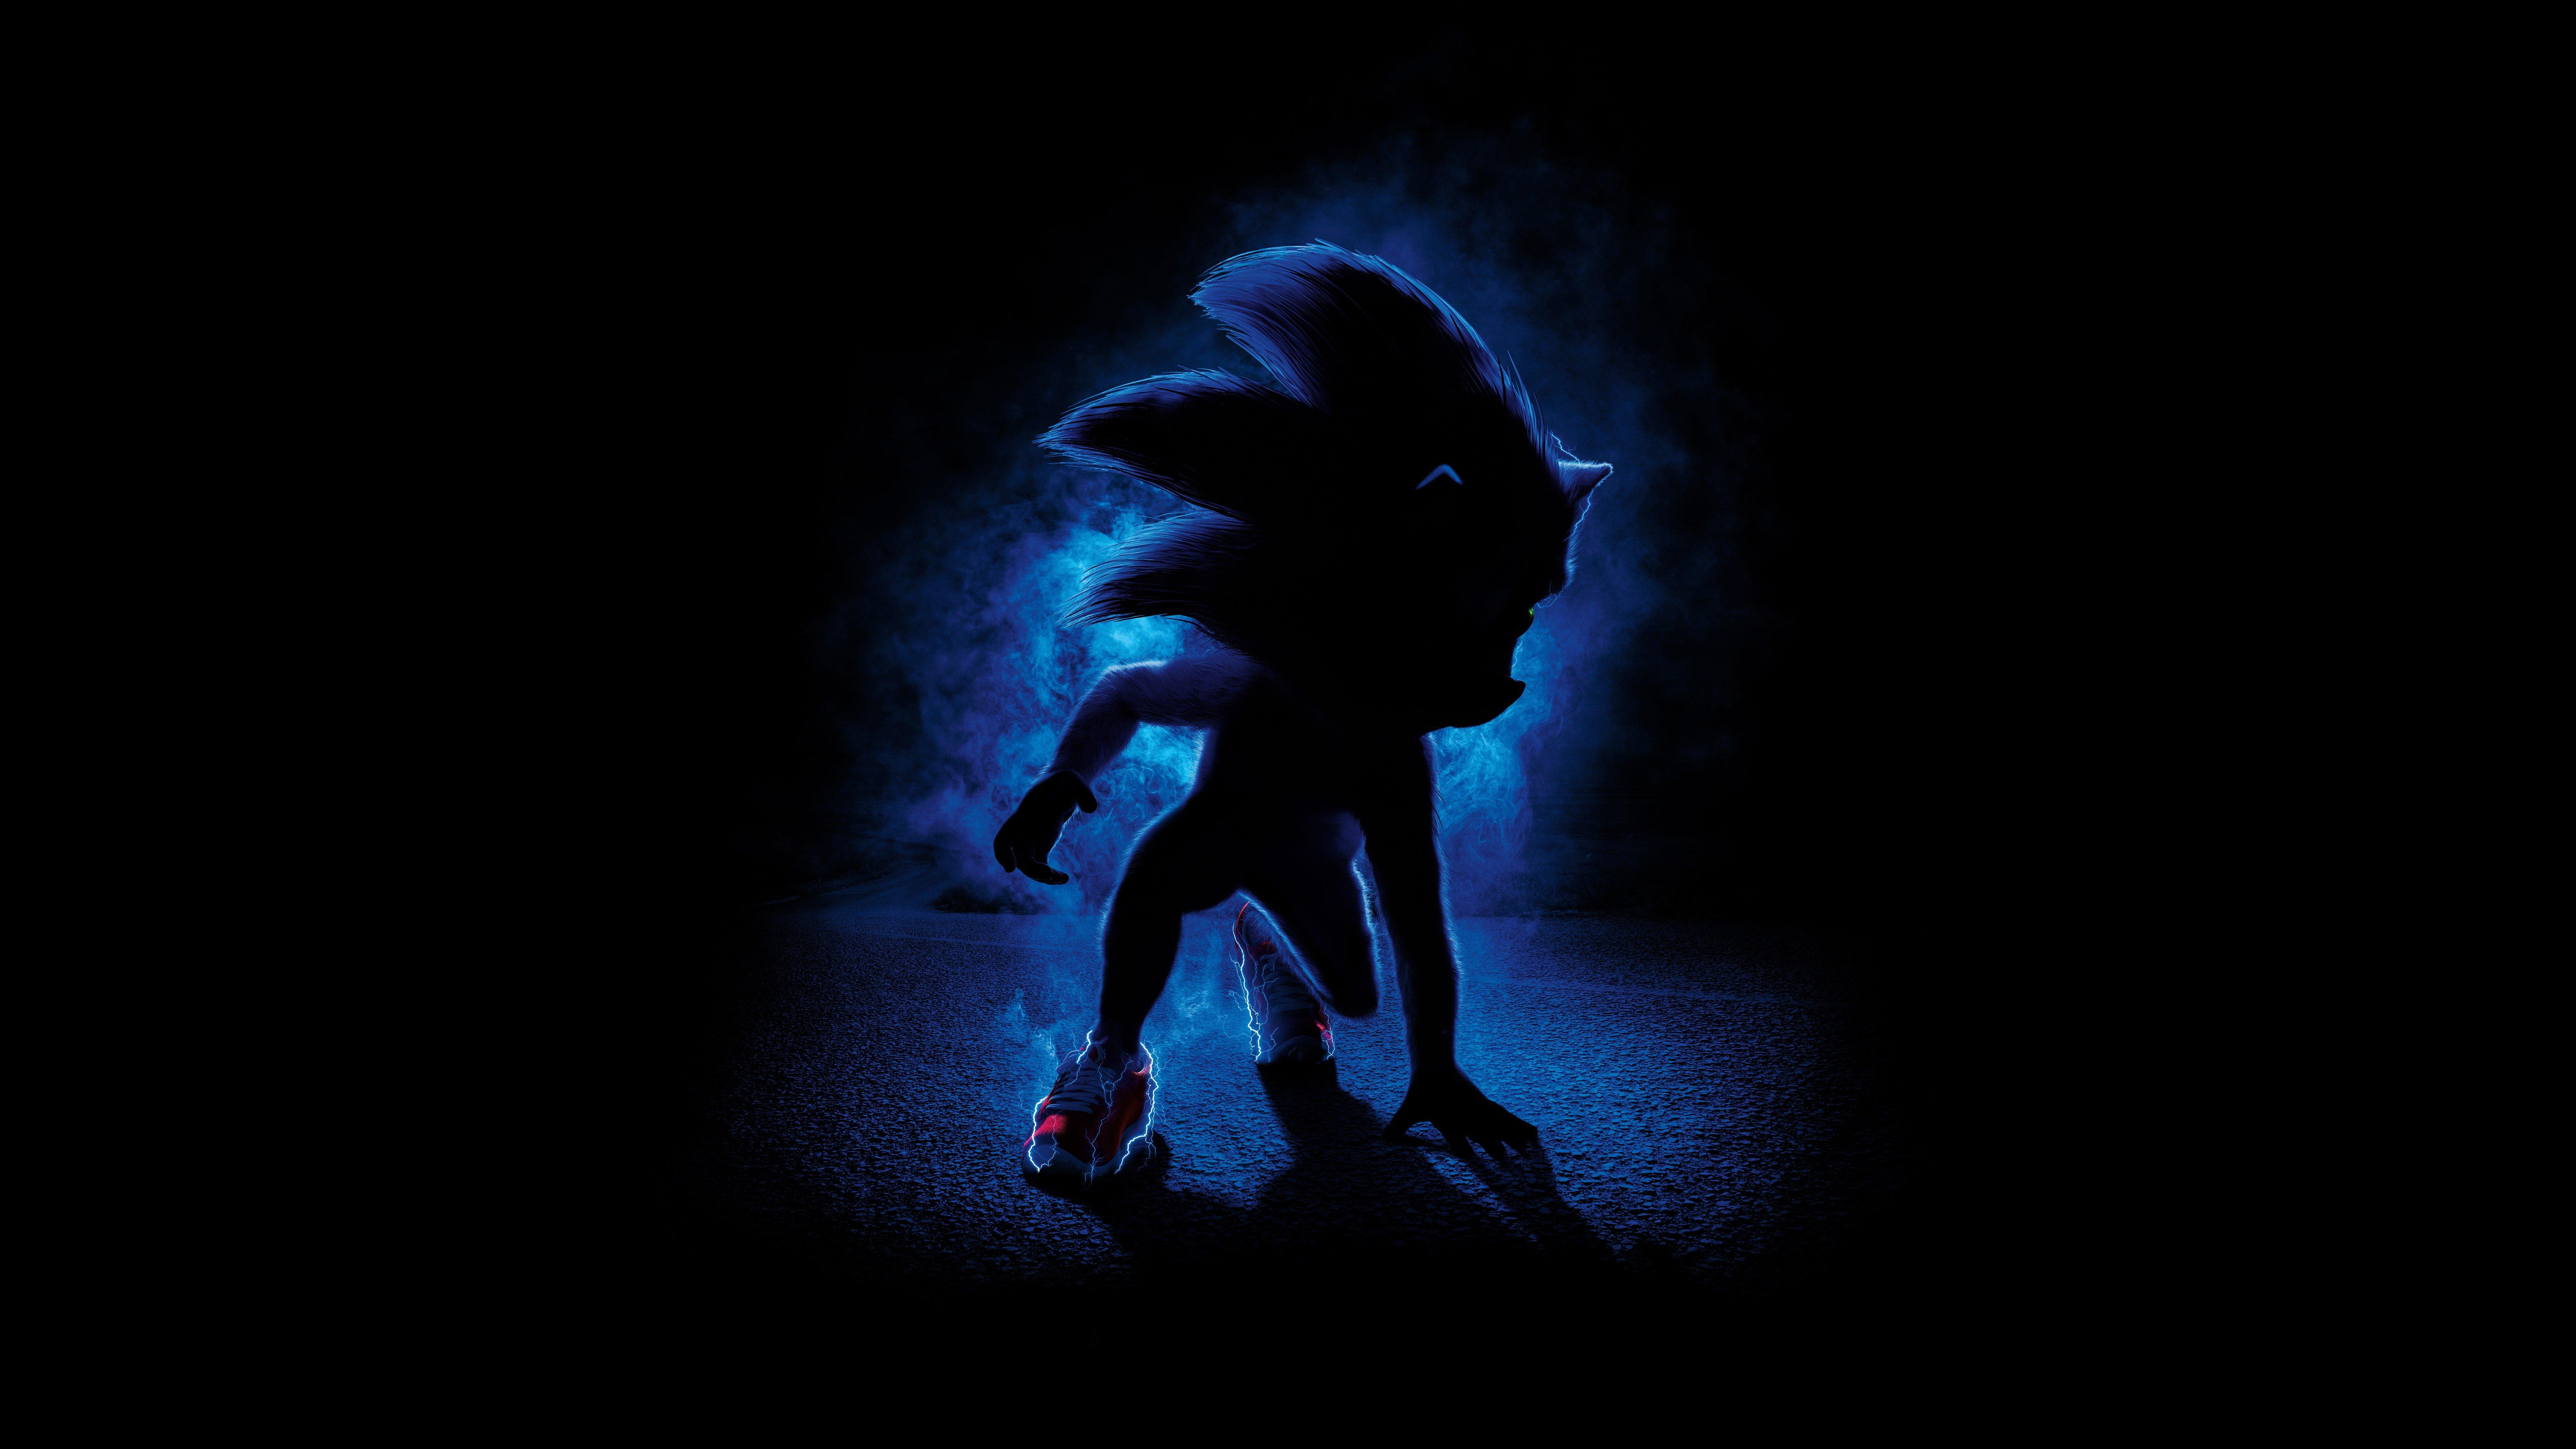 Wallpaper Sonic the Hedgehog Movie